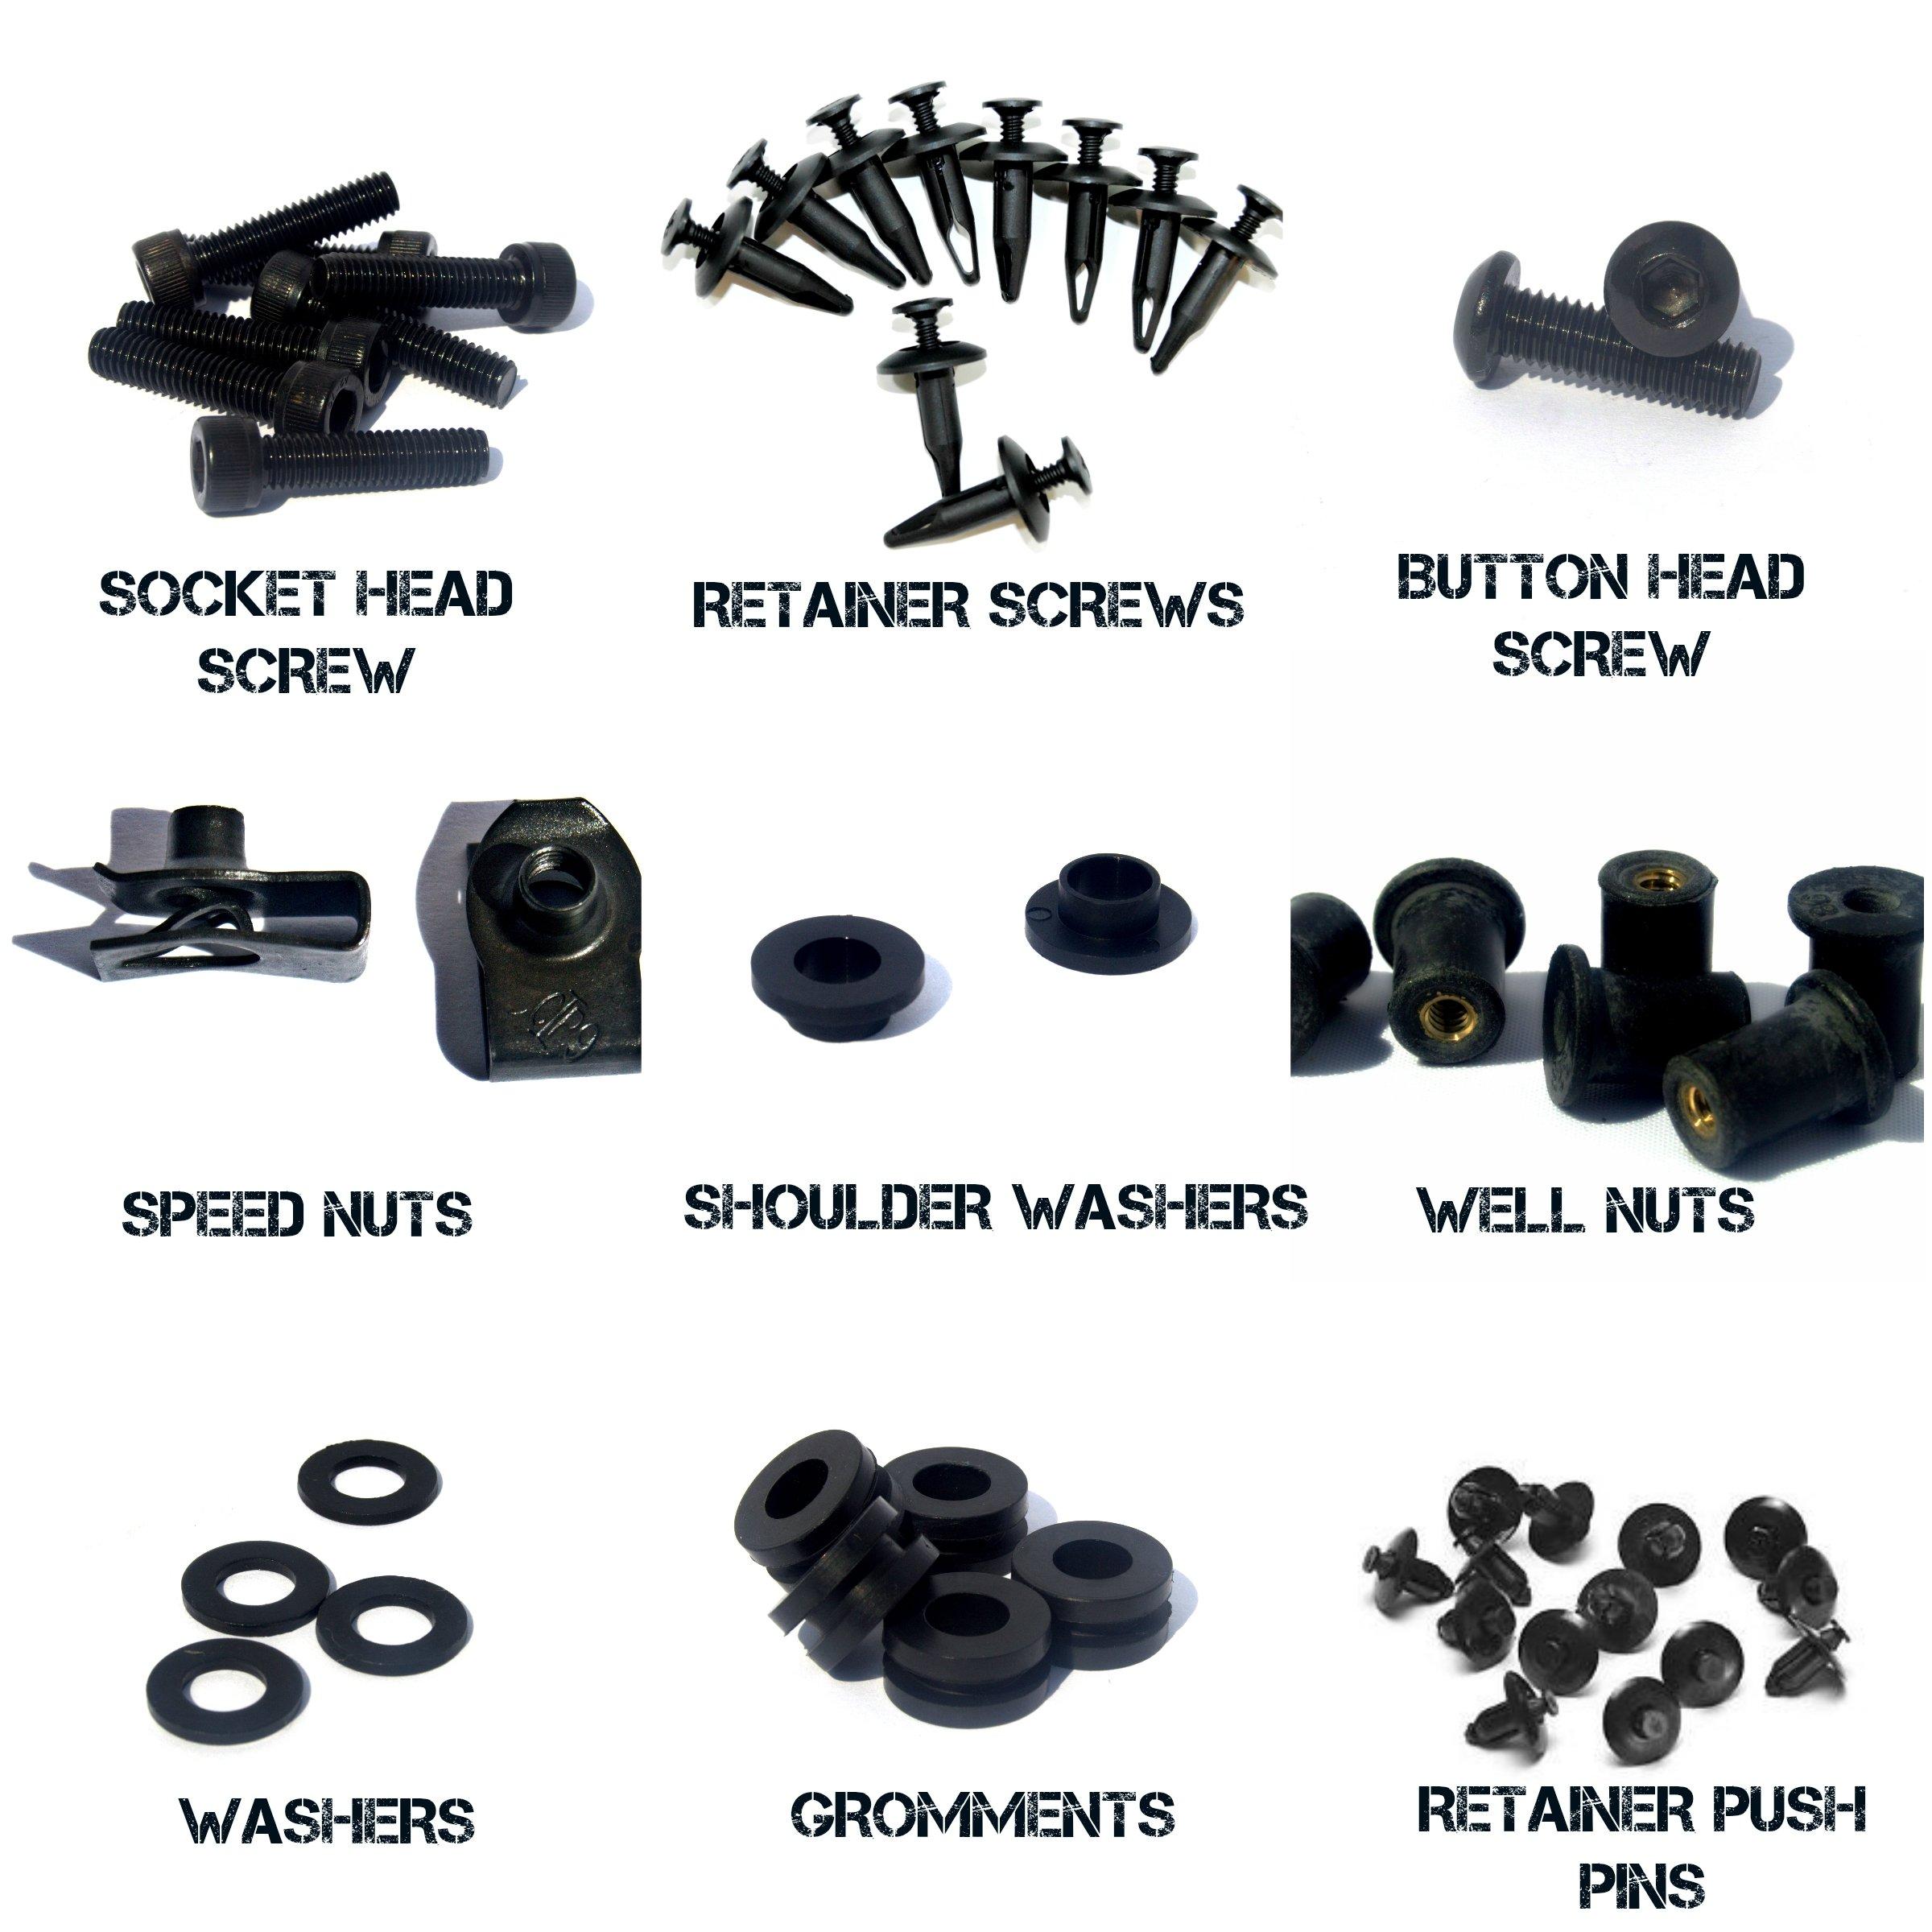 Complete Motorcycle Fairing Bolt Kit Suzuki GSX-R 600 / 750 2004 - 2005 Body Screws, Fasteners, and Hardware by Bike Boltz (Image #4)